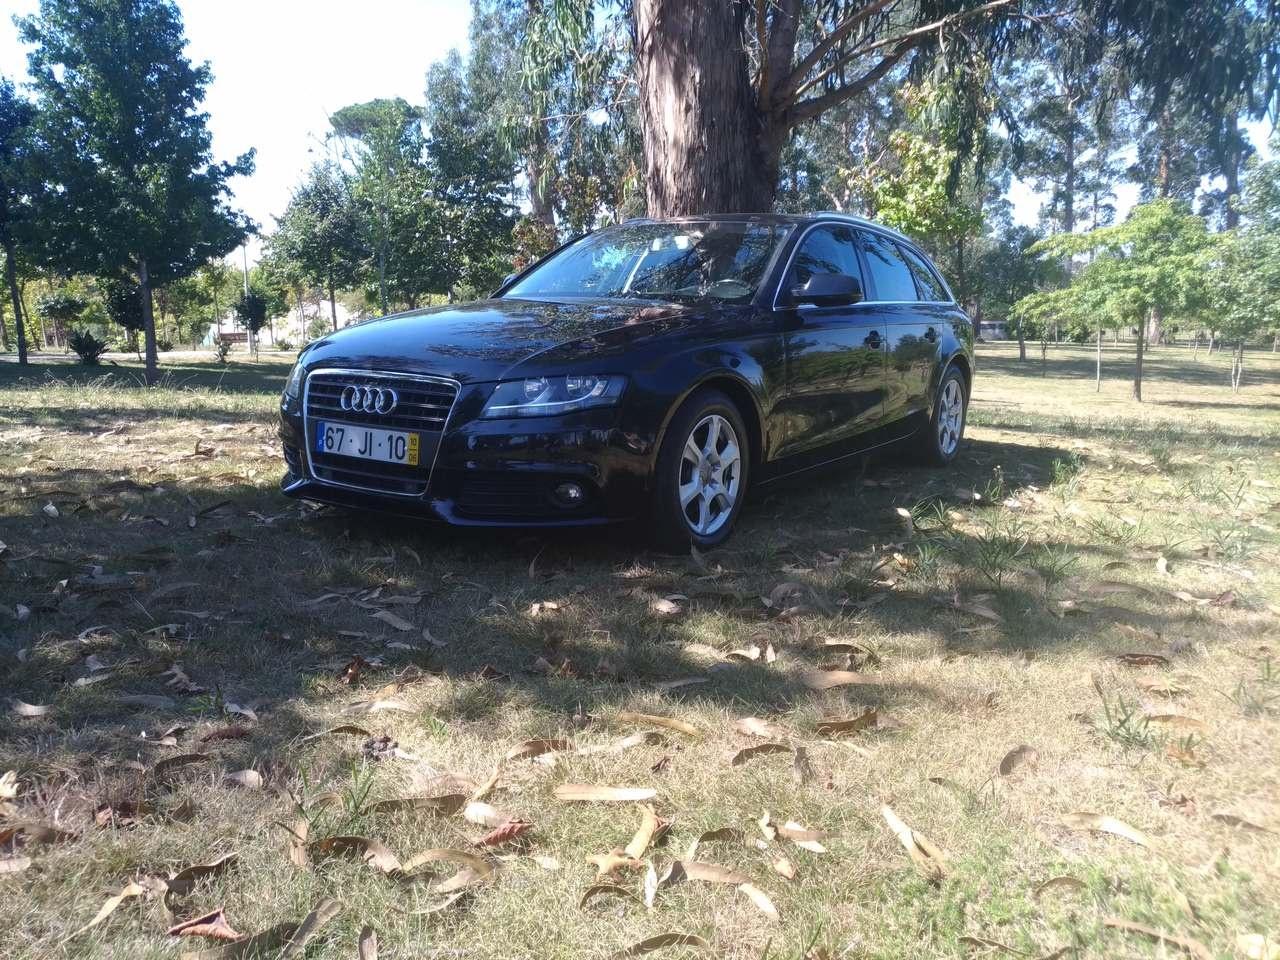 Audi A4 Avant 2.0 Tdi 136cv 6 velocidades Plus Extra 5 lugares 5 portas